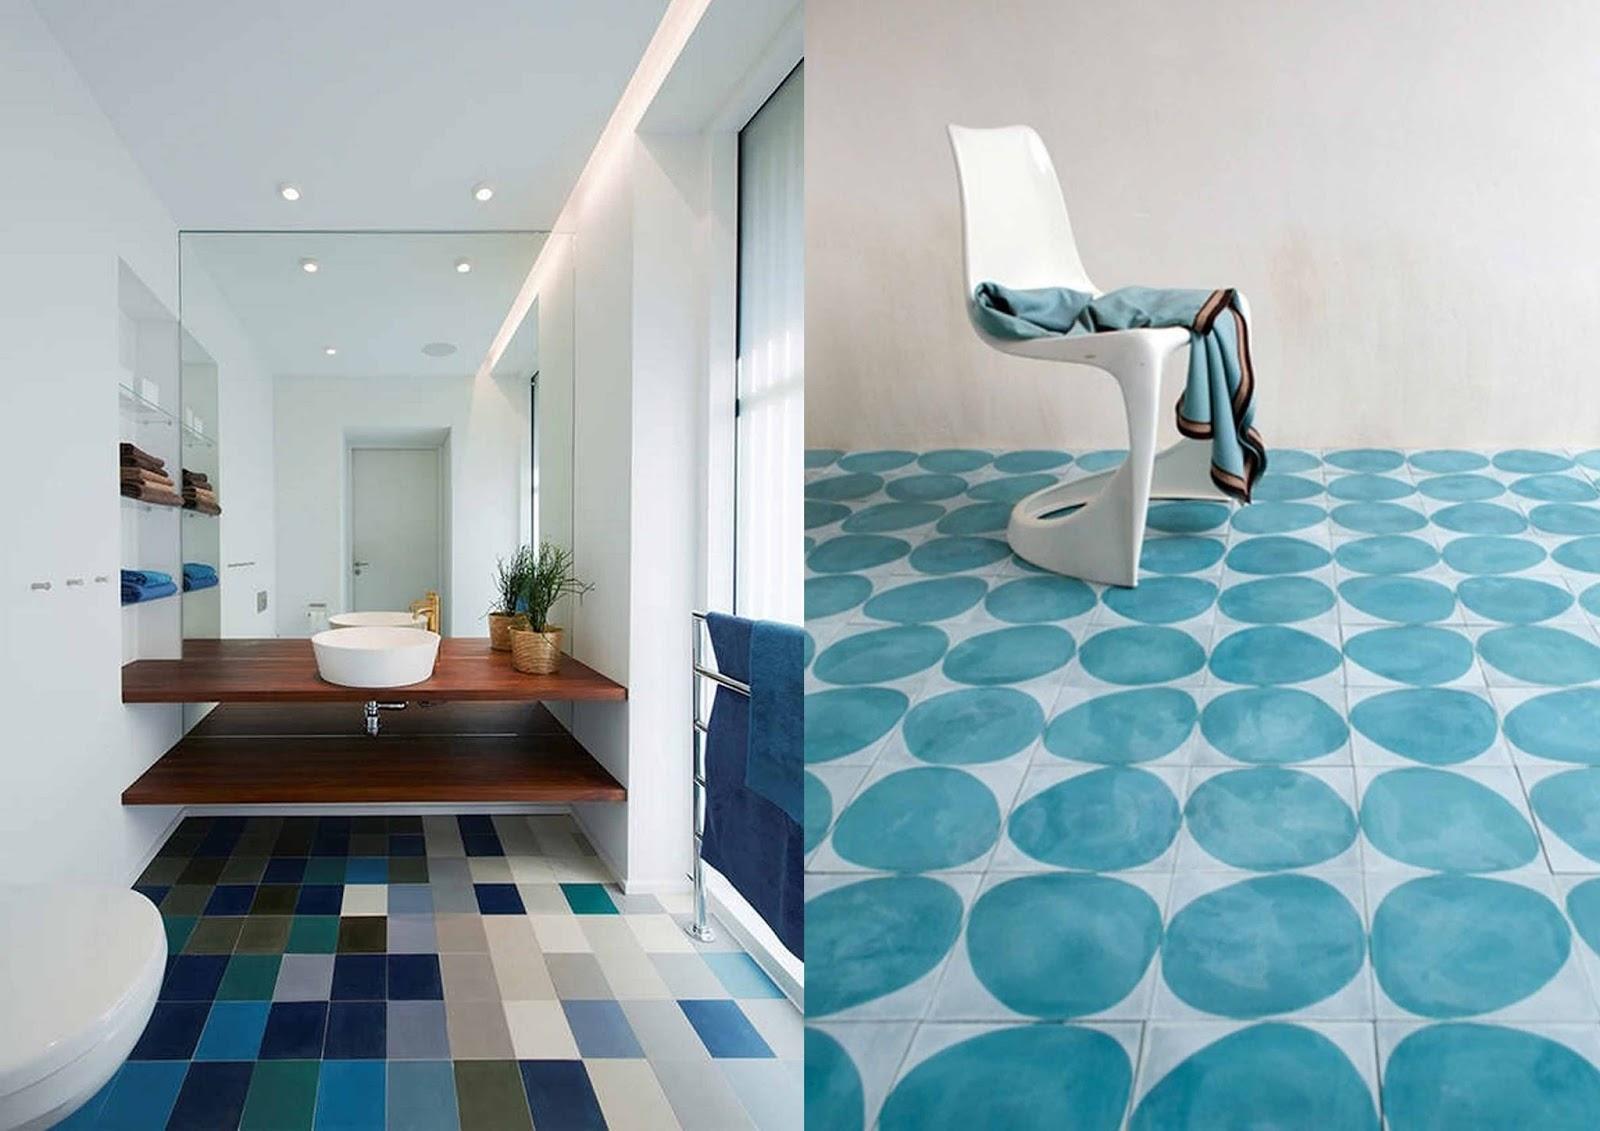 Blue and white bathroom tiles - Blue White Bathroom Tiles Gradient Tiles Subway Tiles White Chair Blue Pebbles